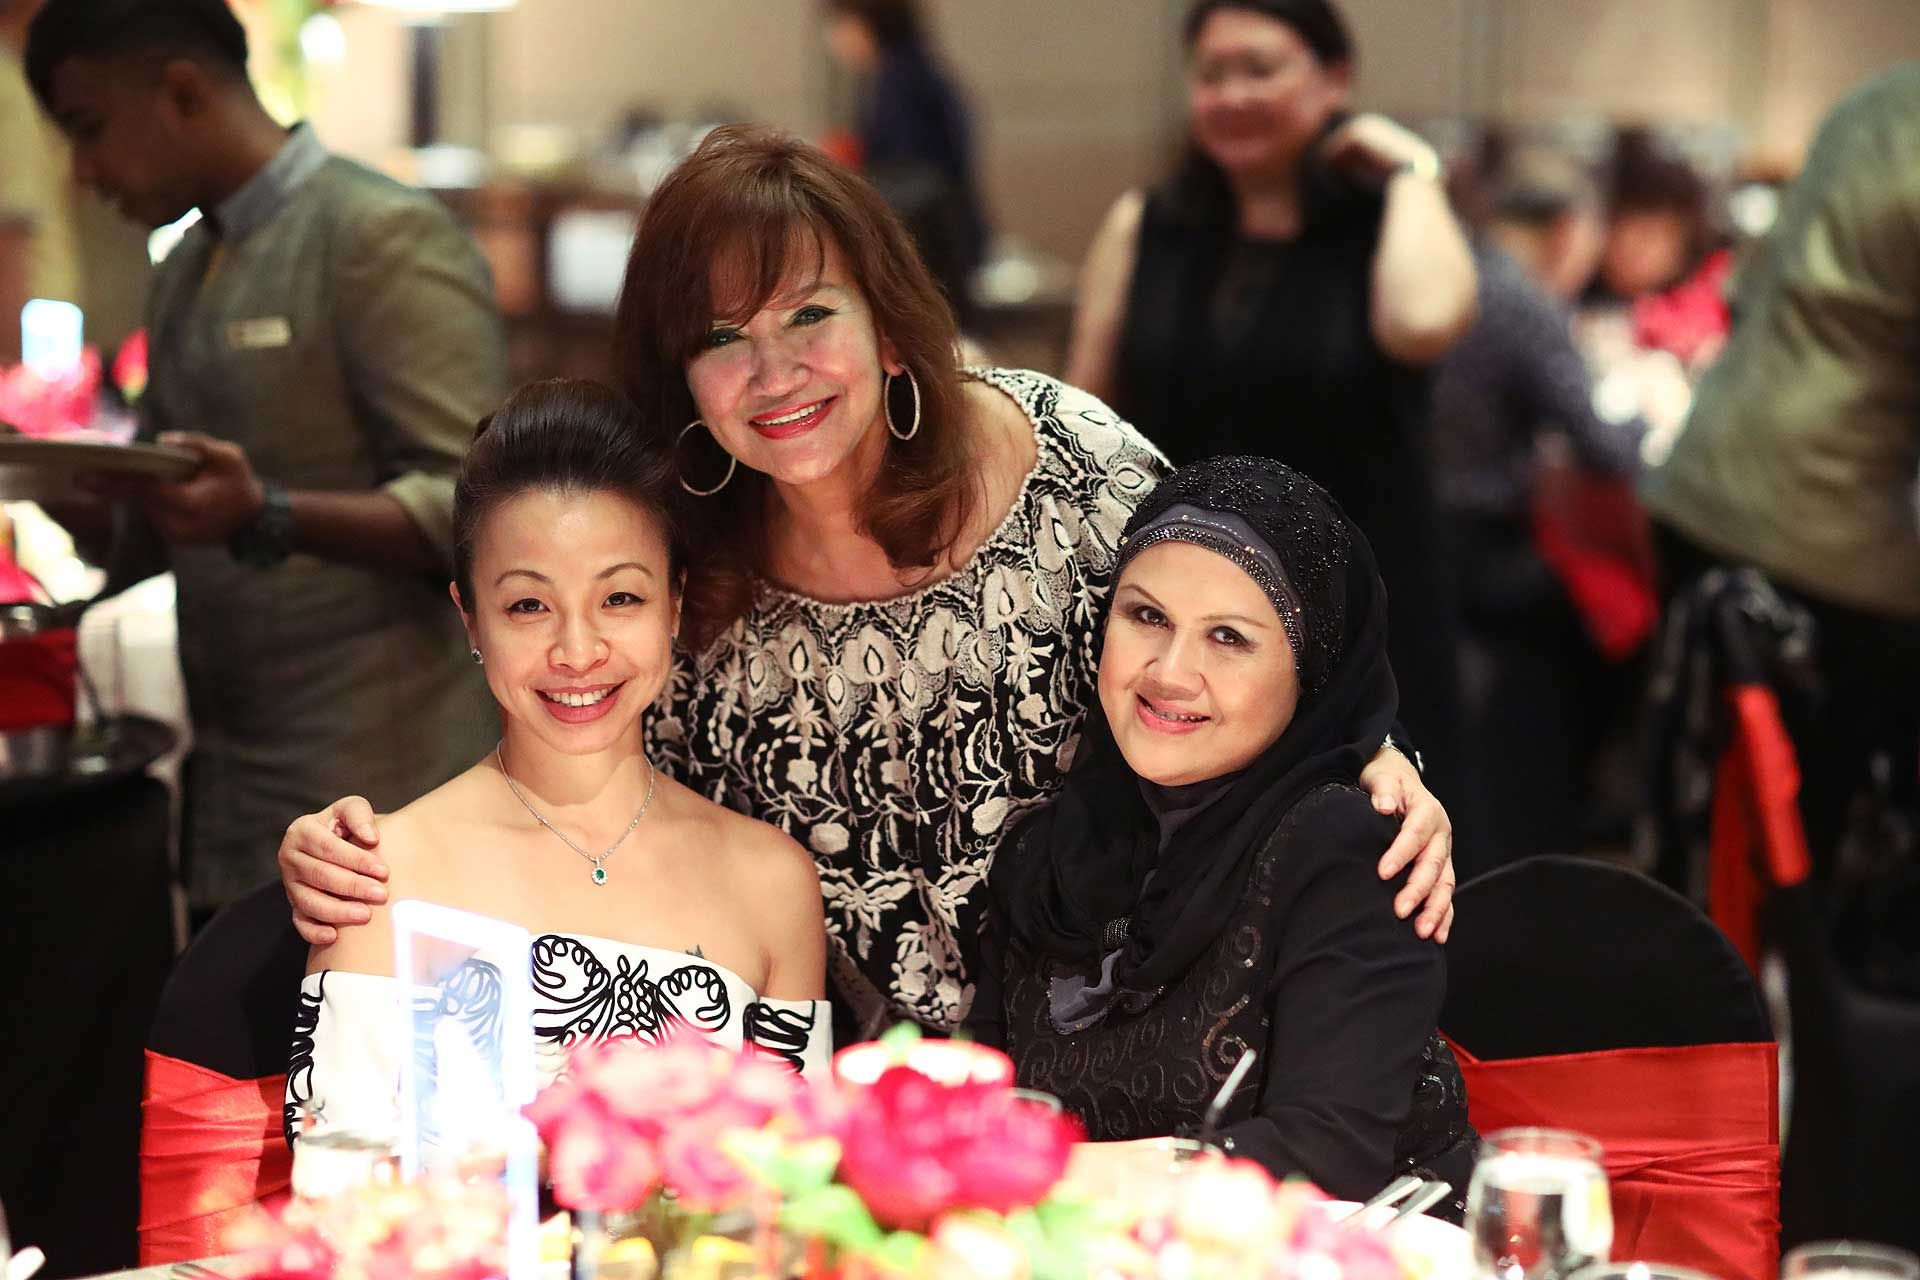 Elizabeth Marini, Dato' Rosemarie Wee and Dato' Seri Toh Puan Noor Suzanna Abdullah